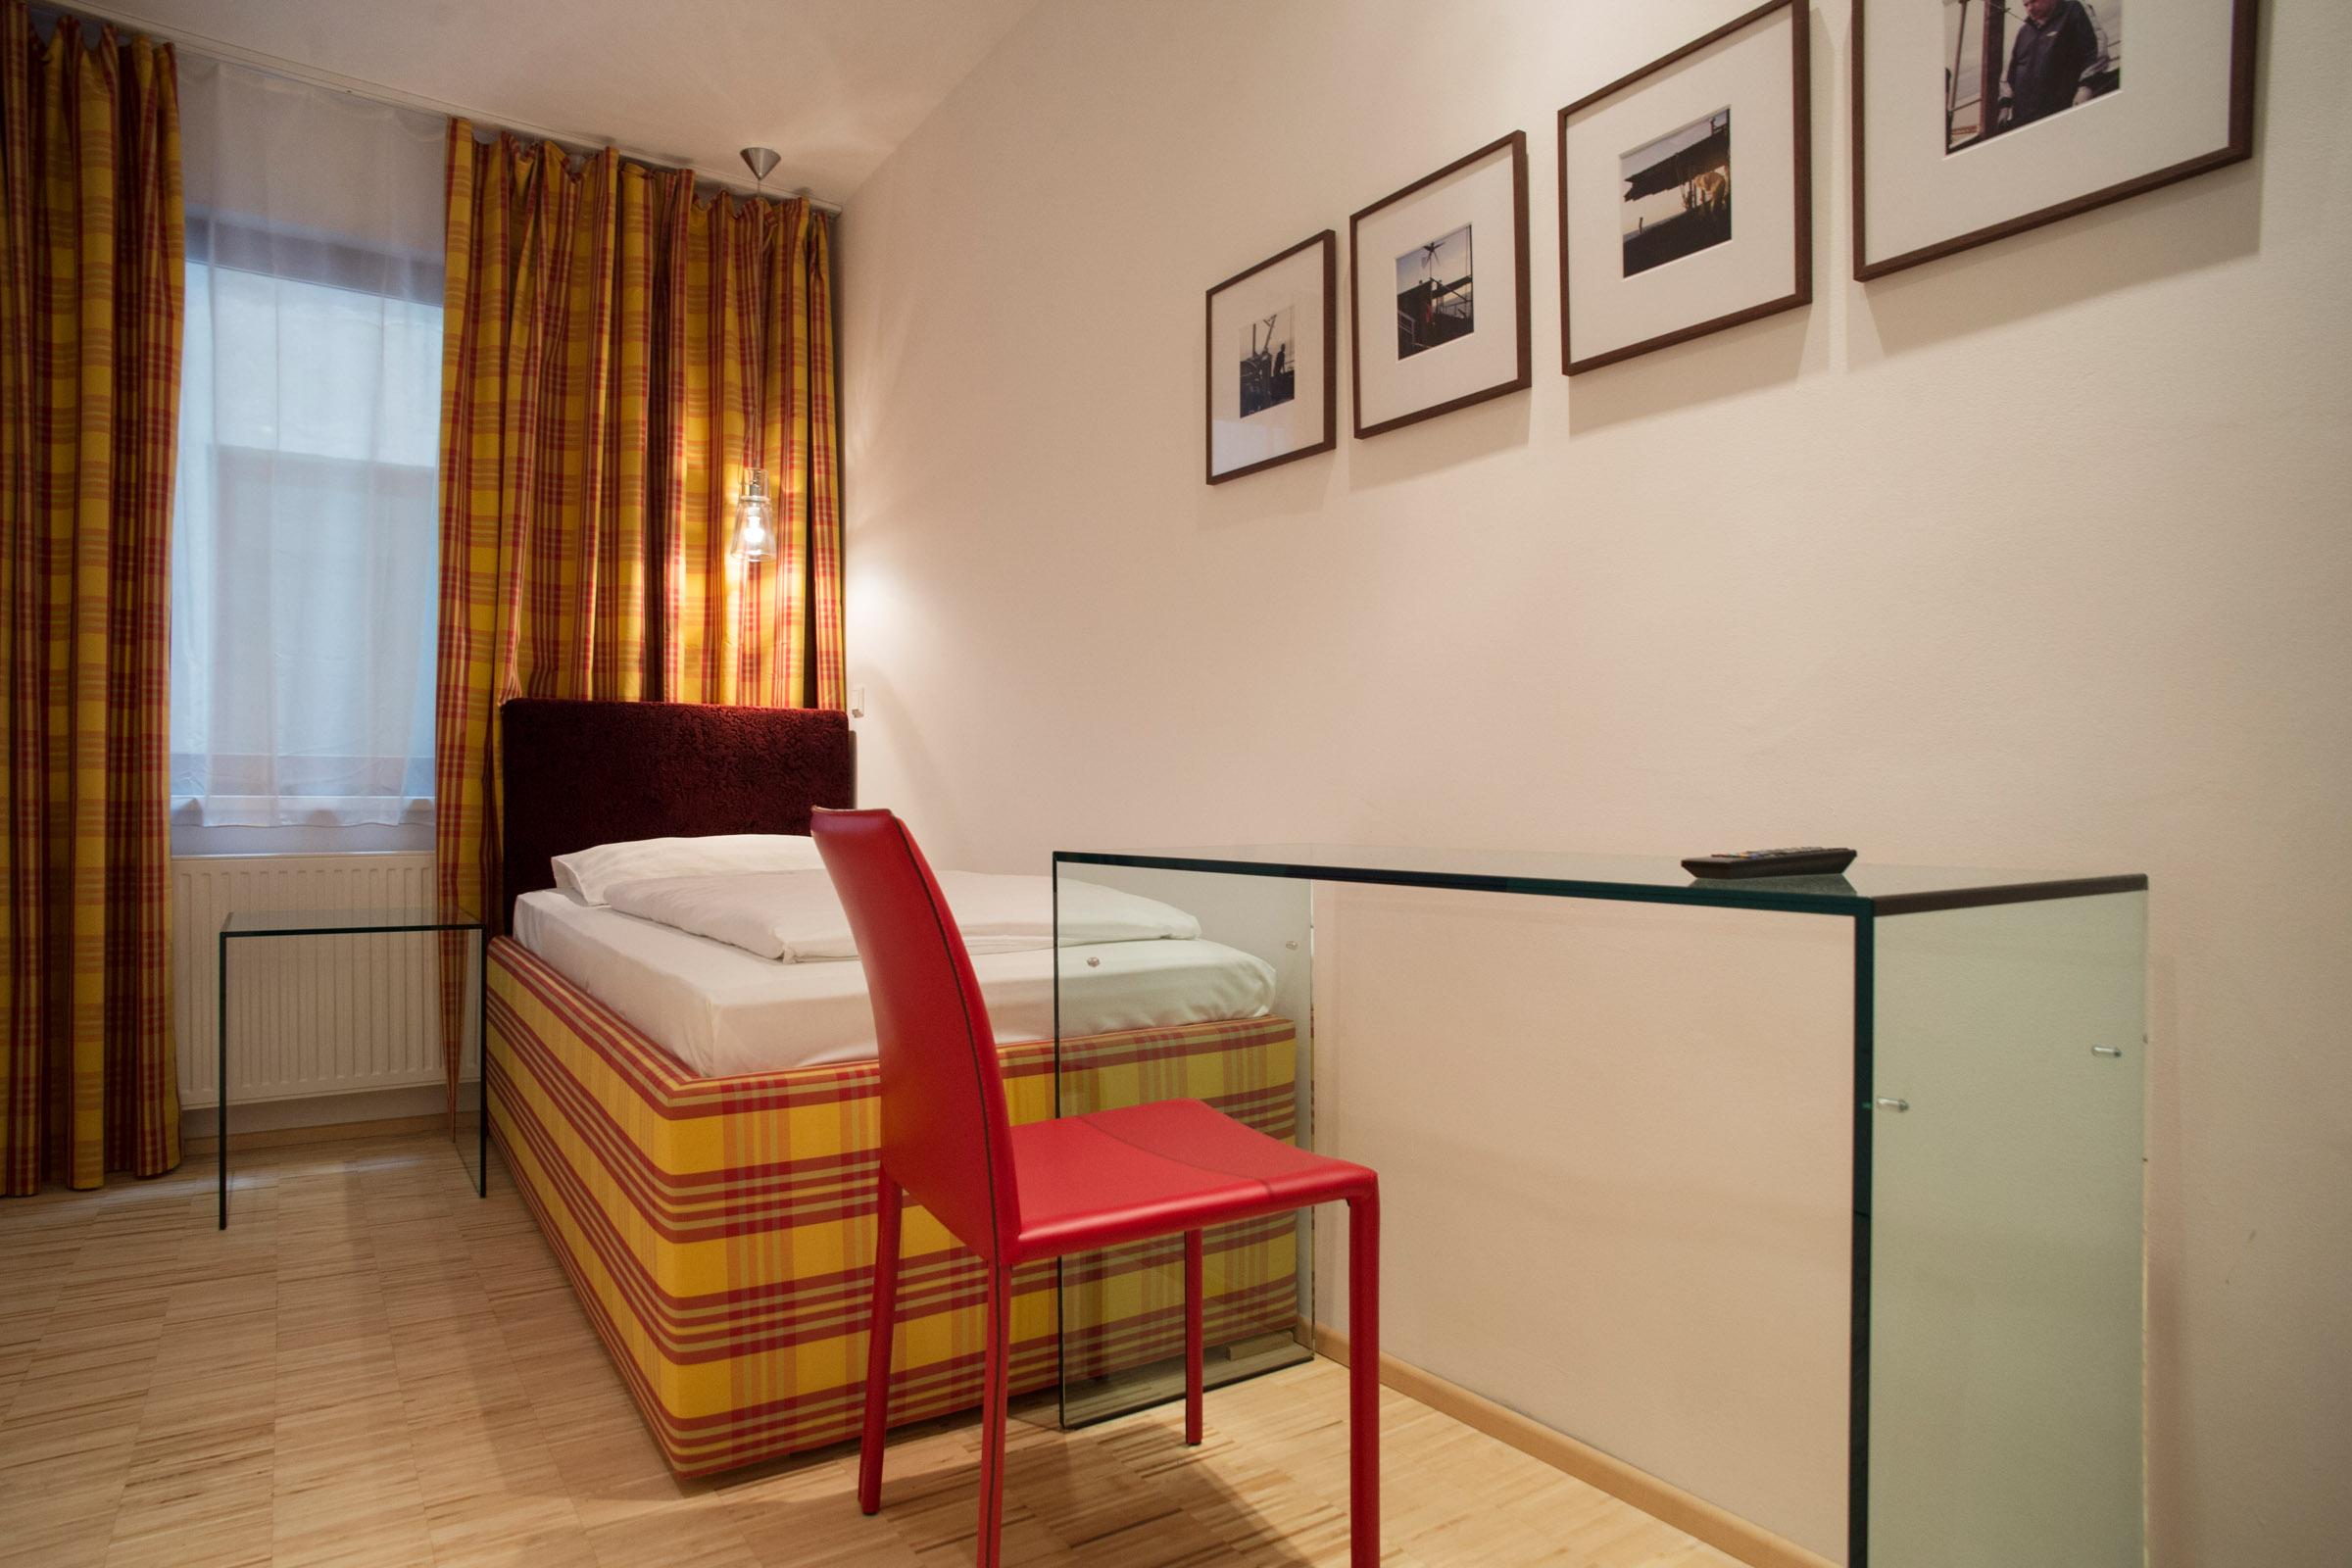 20120924_Hotel Kunsthof_Zimmer_X-Small_206_2400